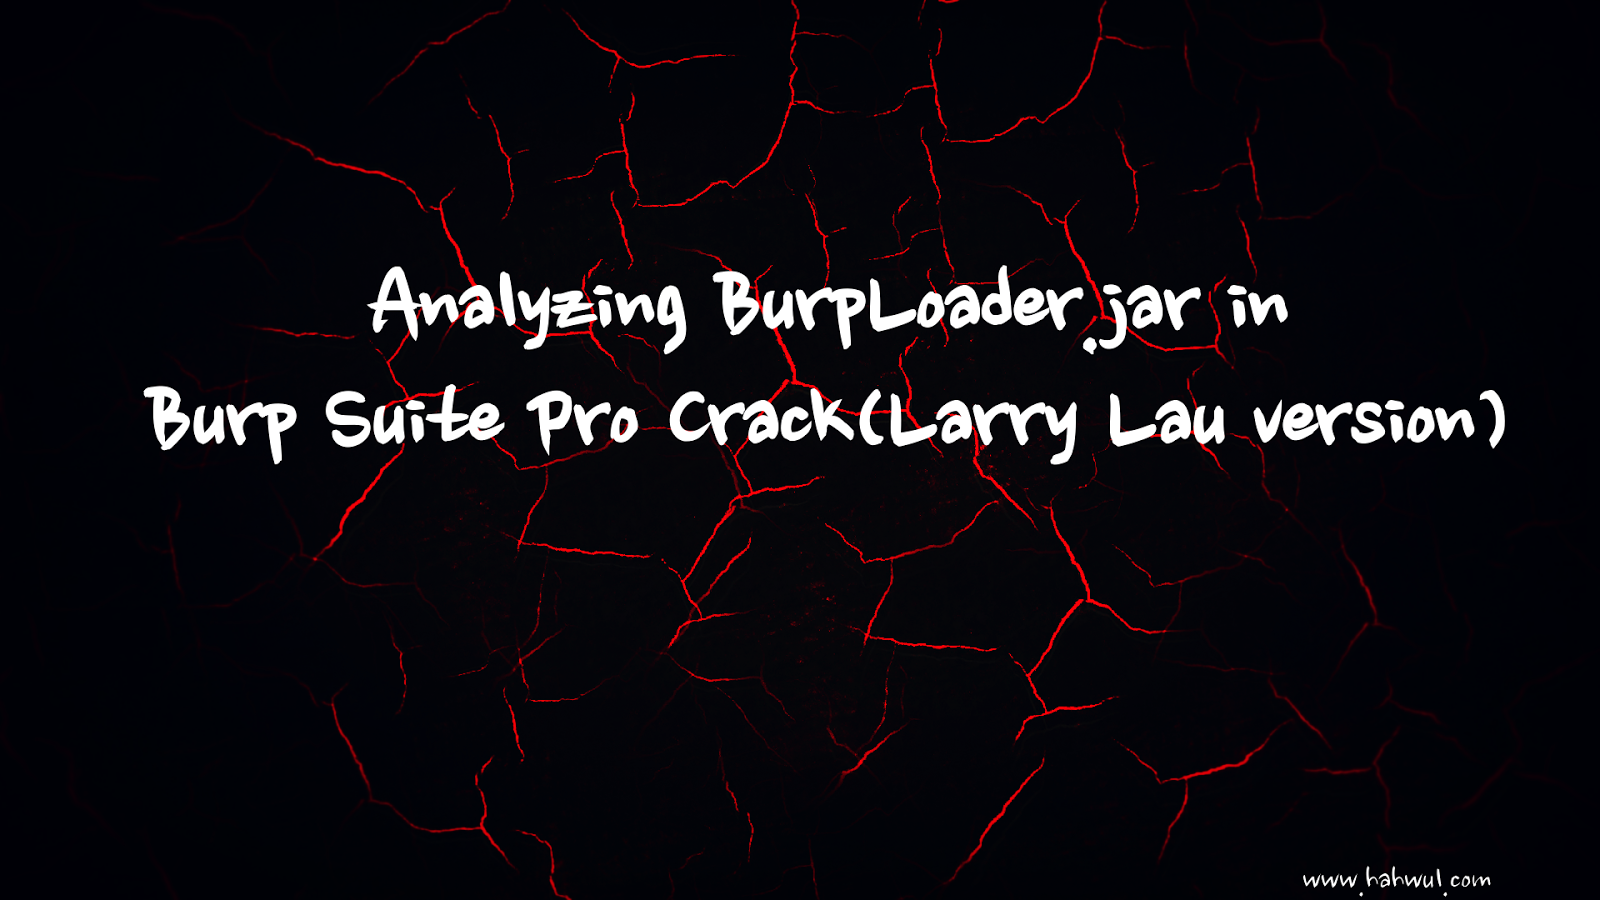 HACKING] Analyzing BurpLoader jar in Burp Suite Pro Crack